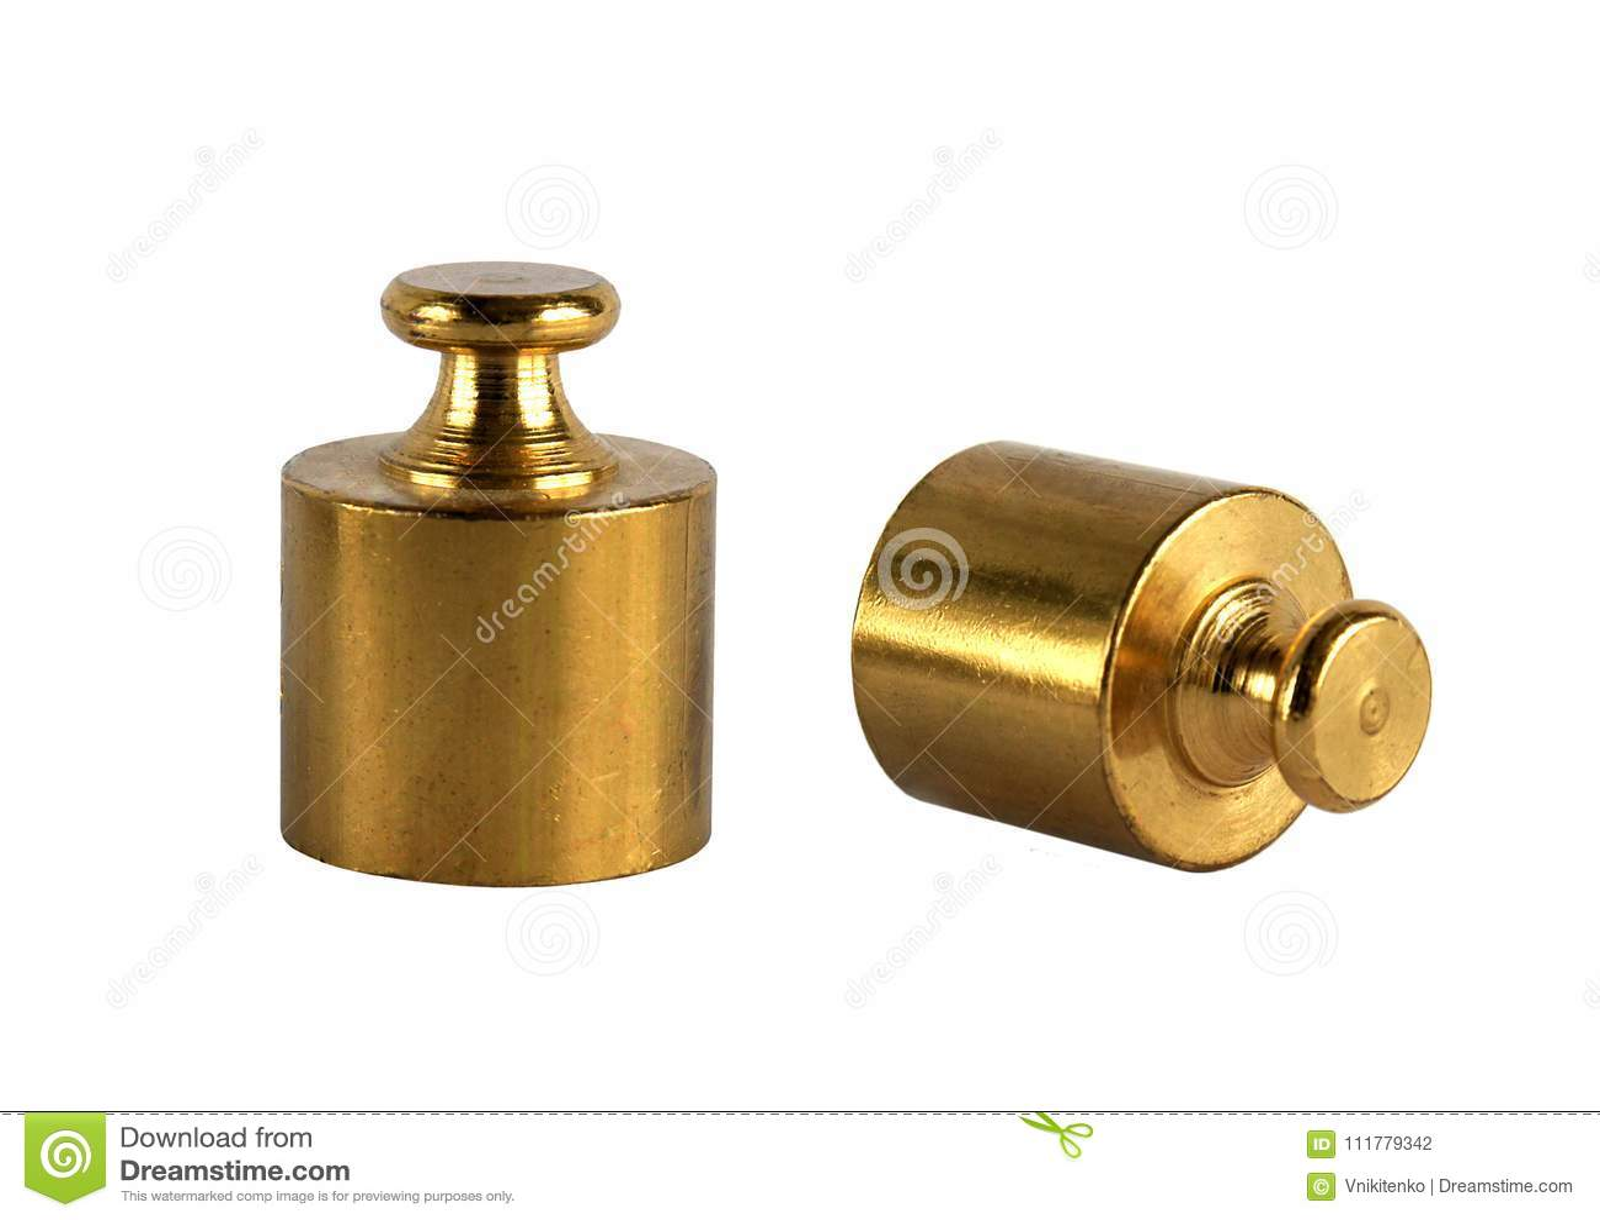 Two miniature bronze vintage weights